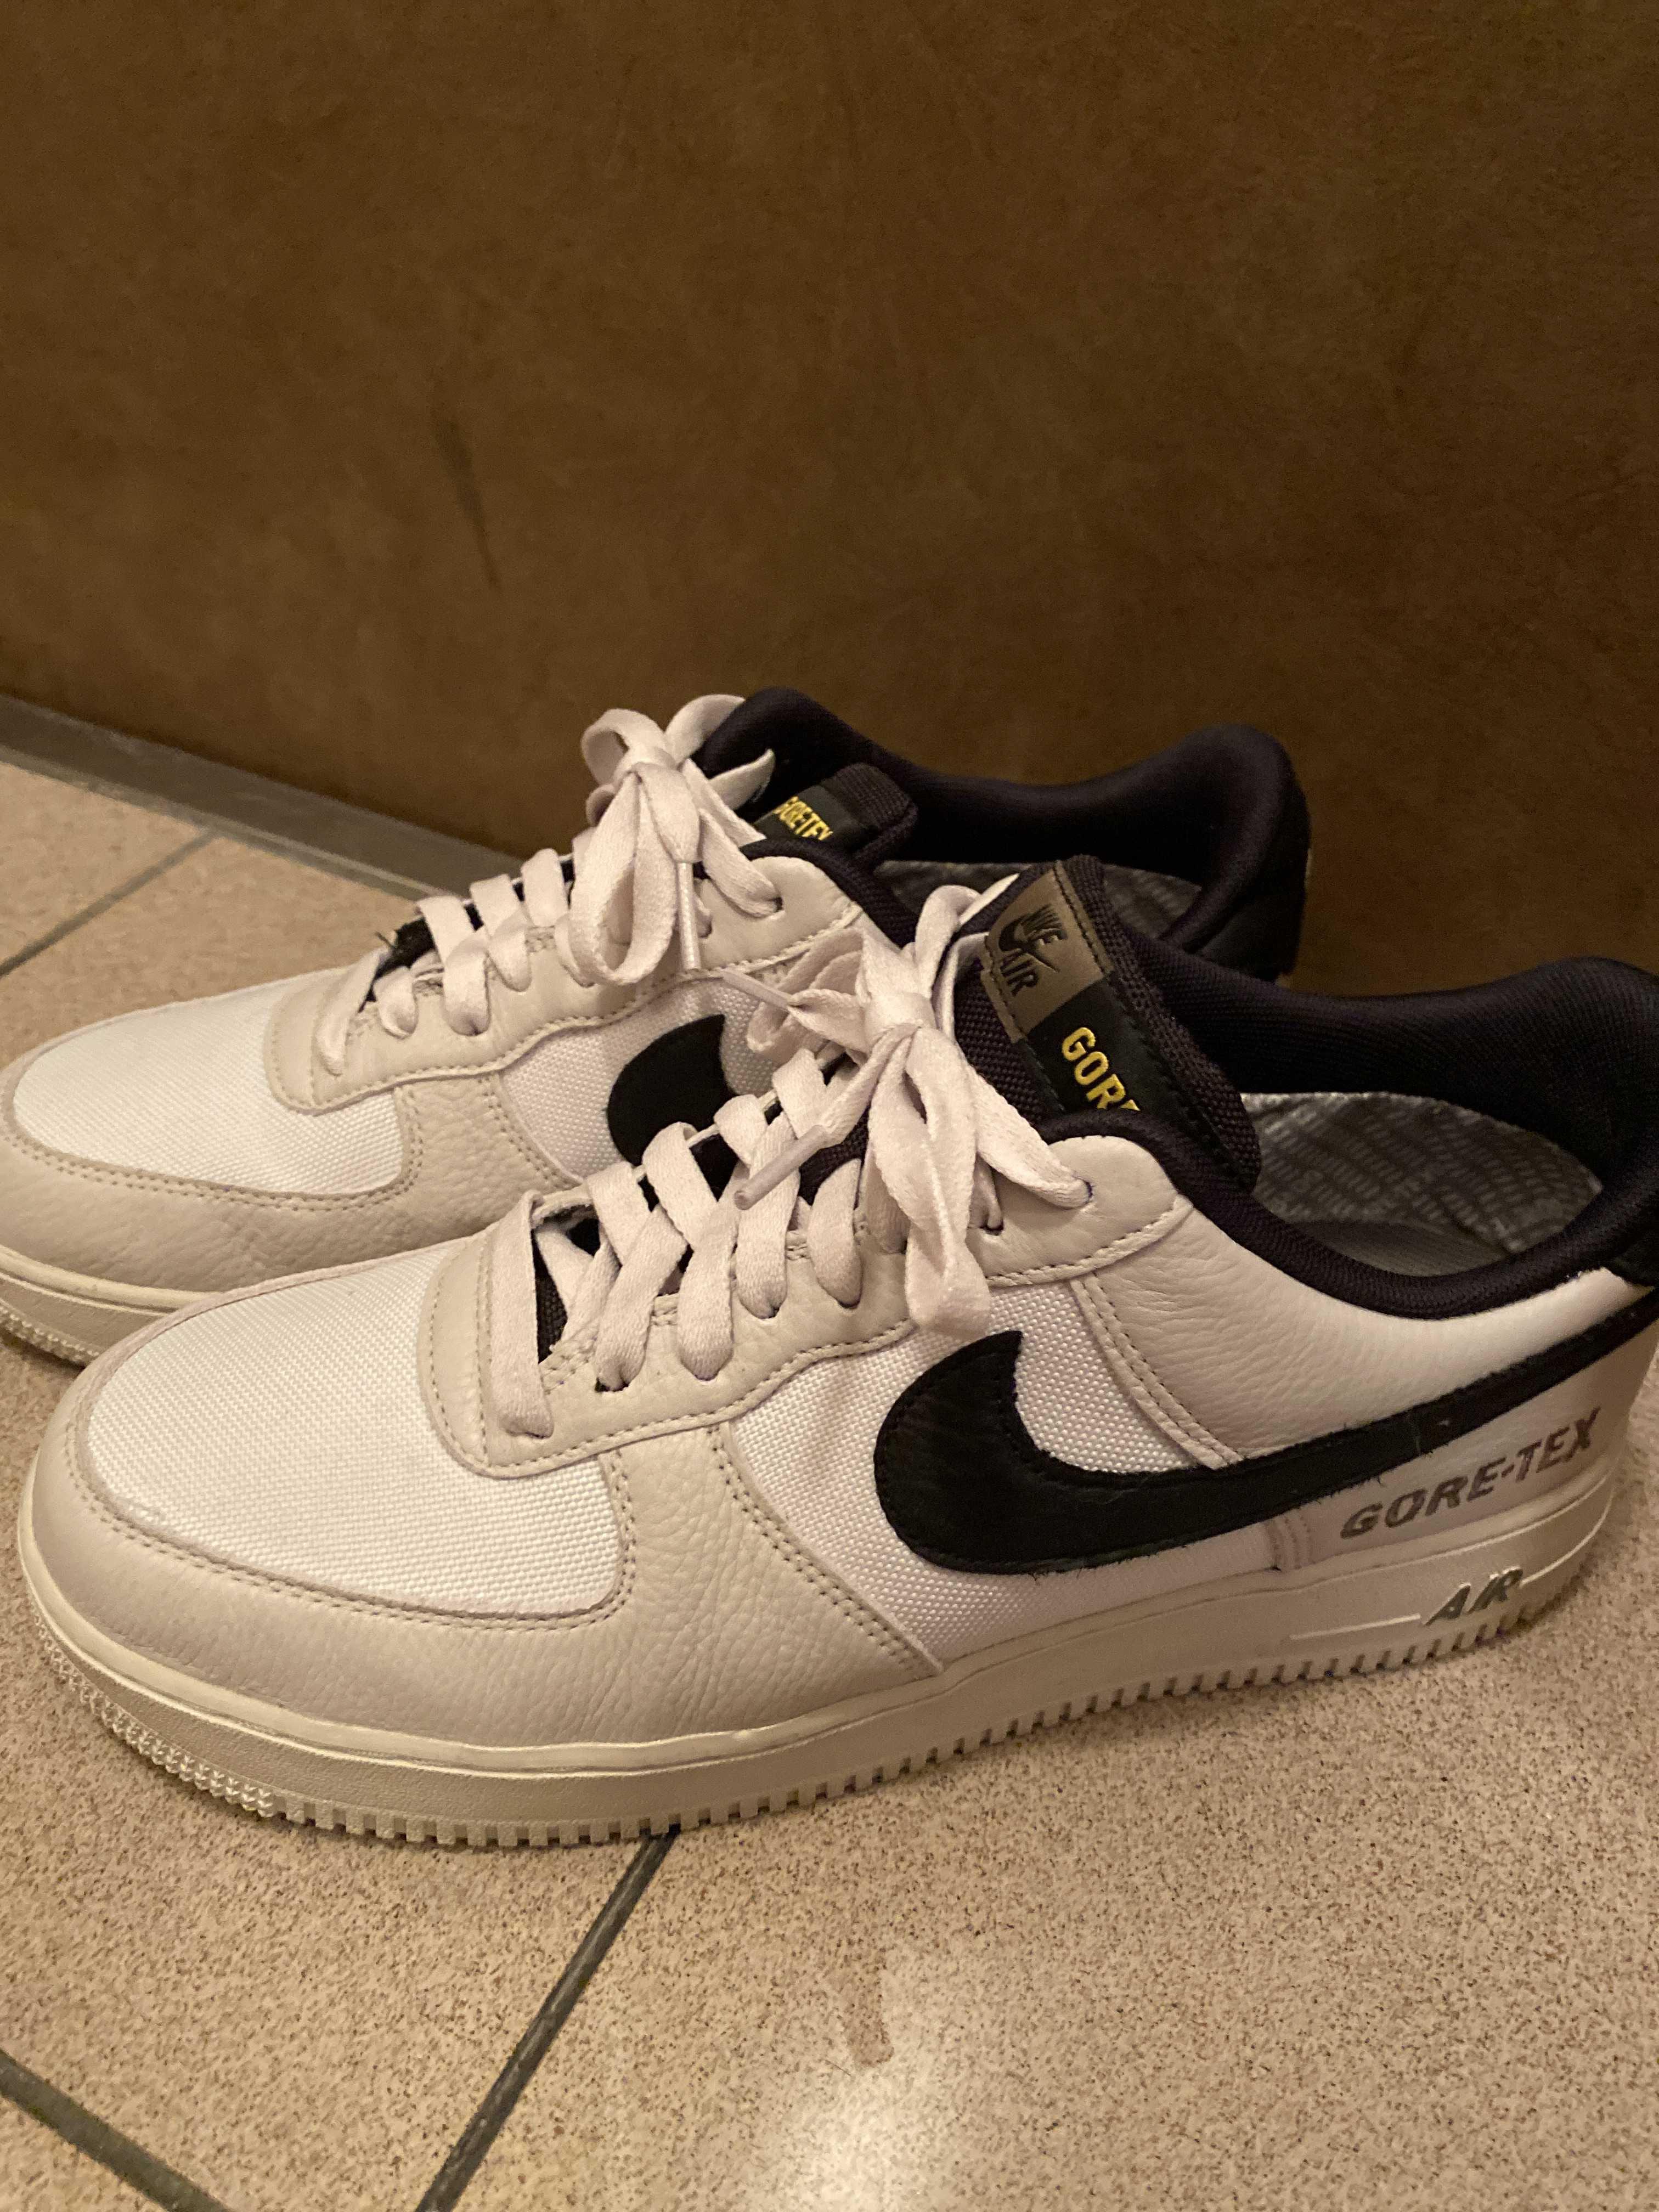 Nike Air Force One Low Gore-Tex White Sail Black